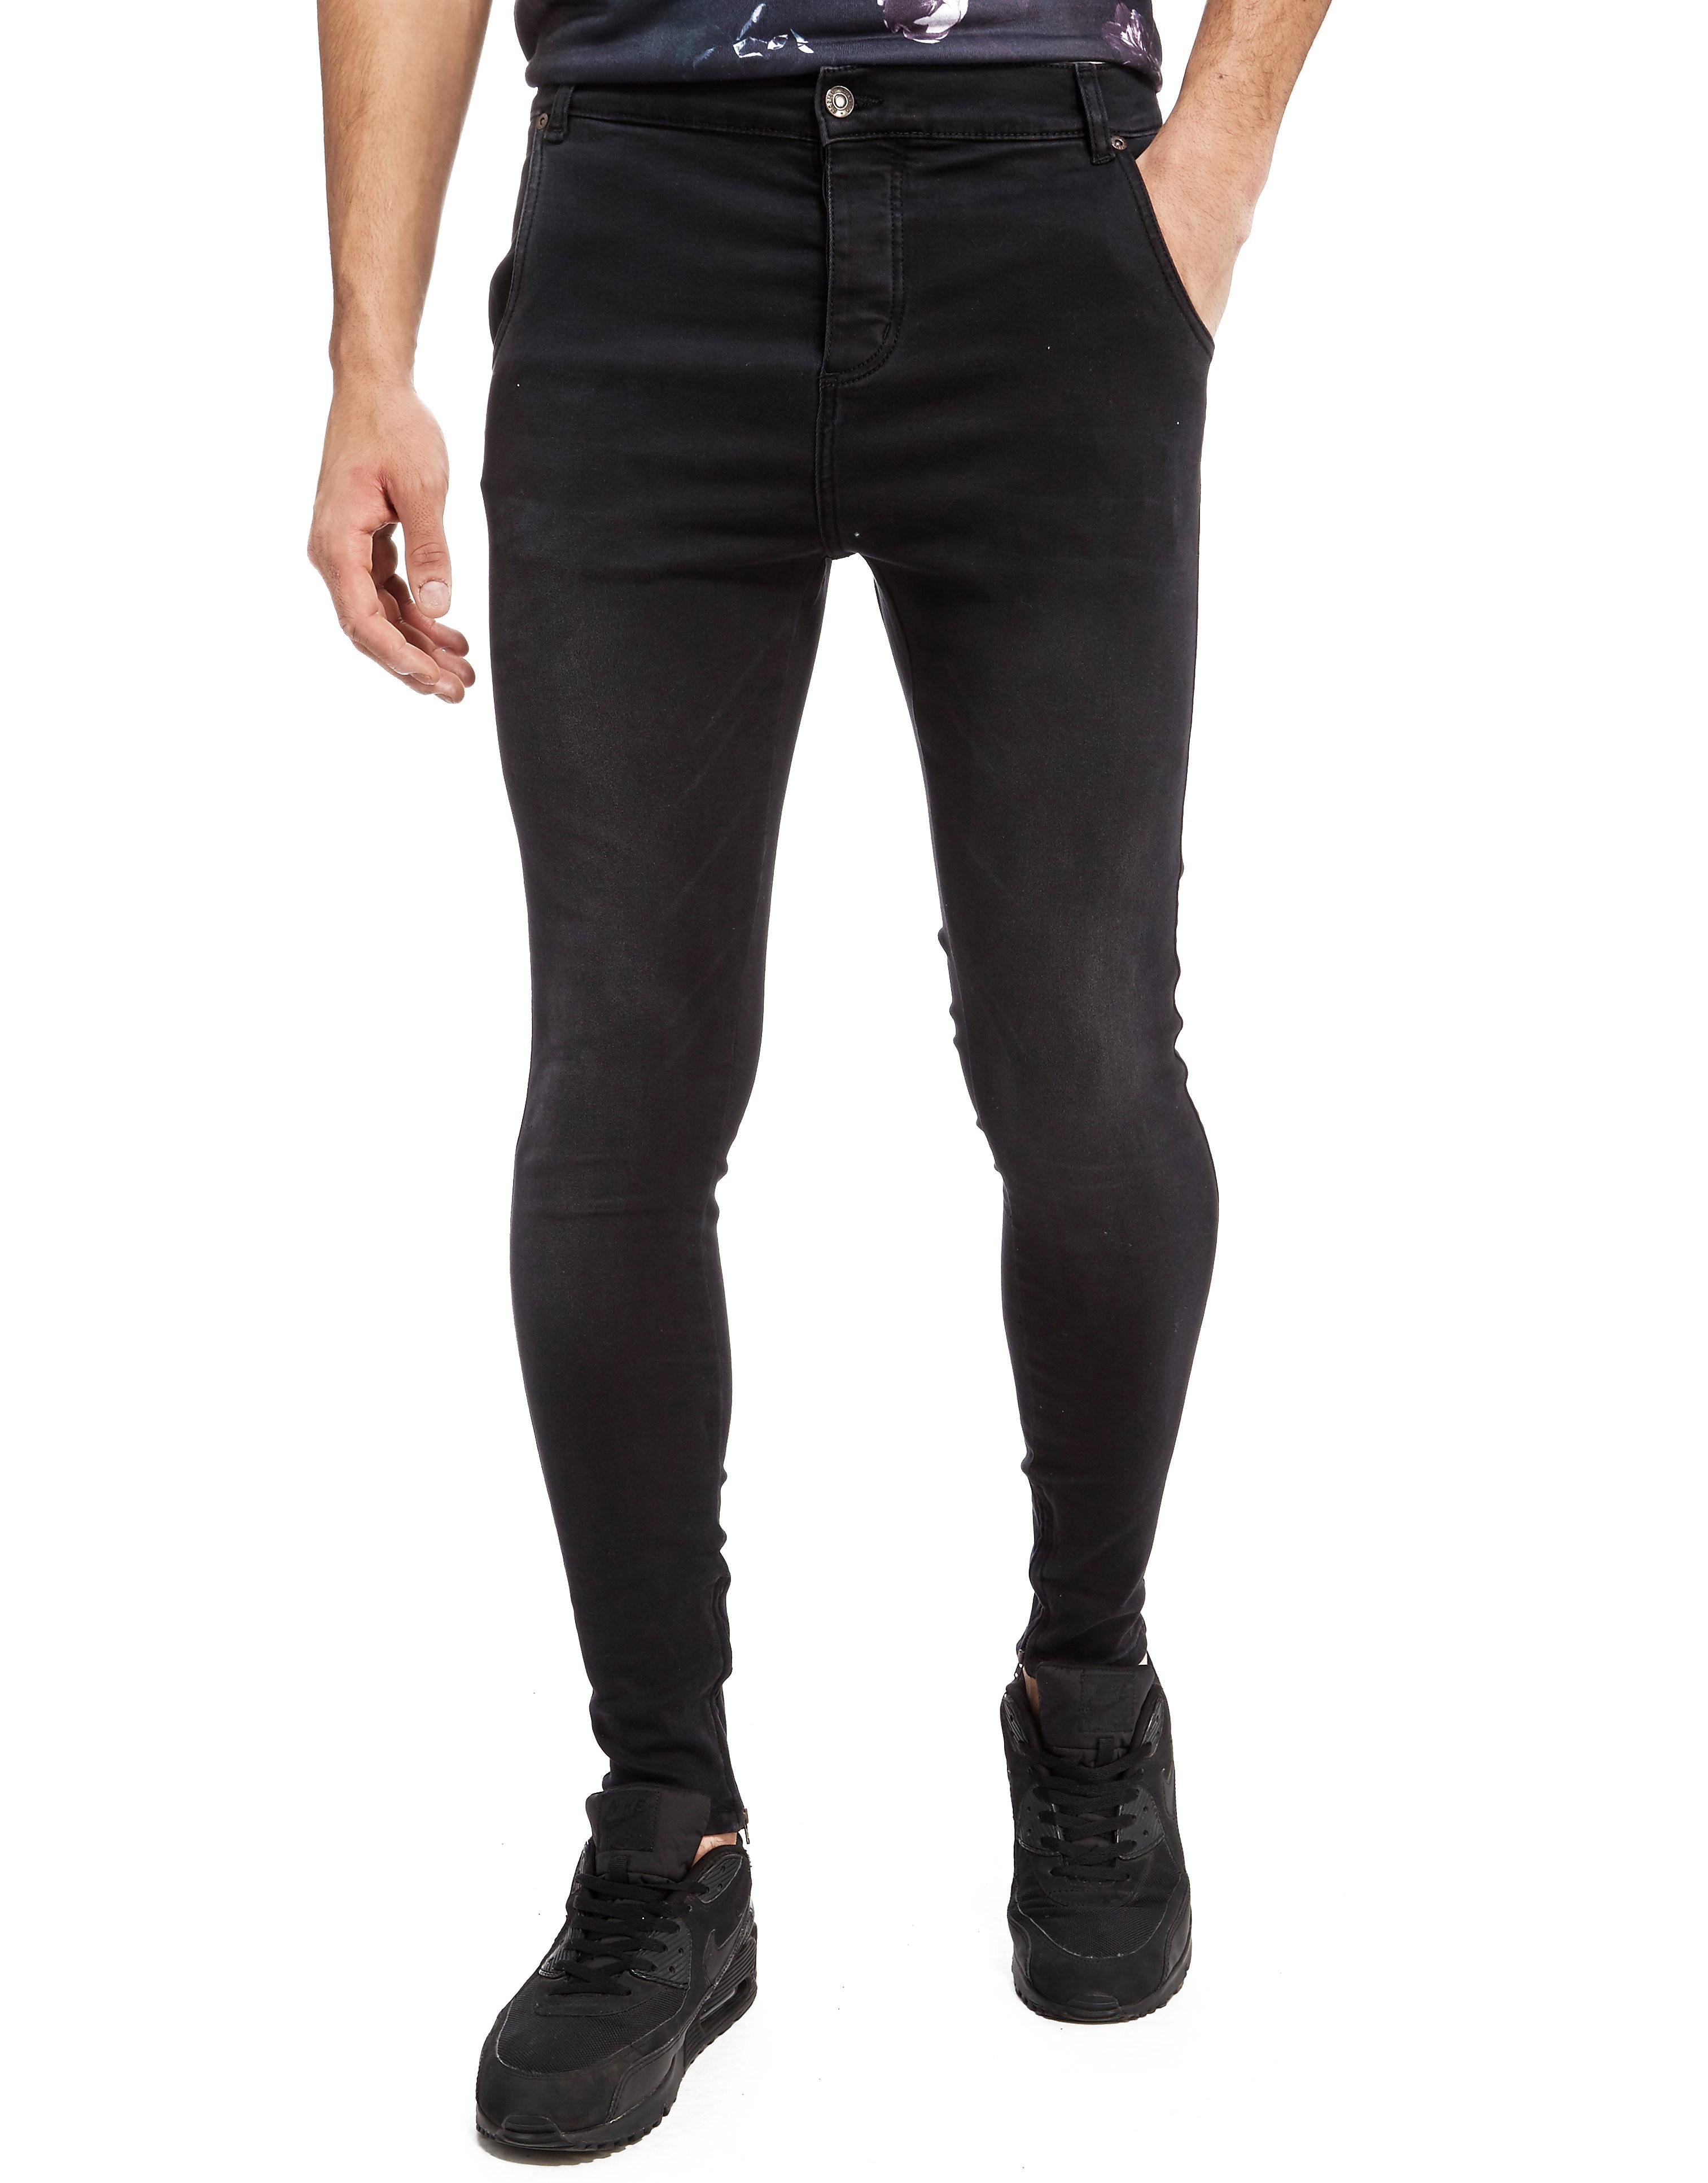 SikSilk Low Rise Skinny Jeans